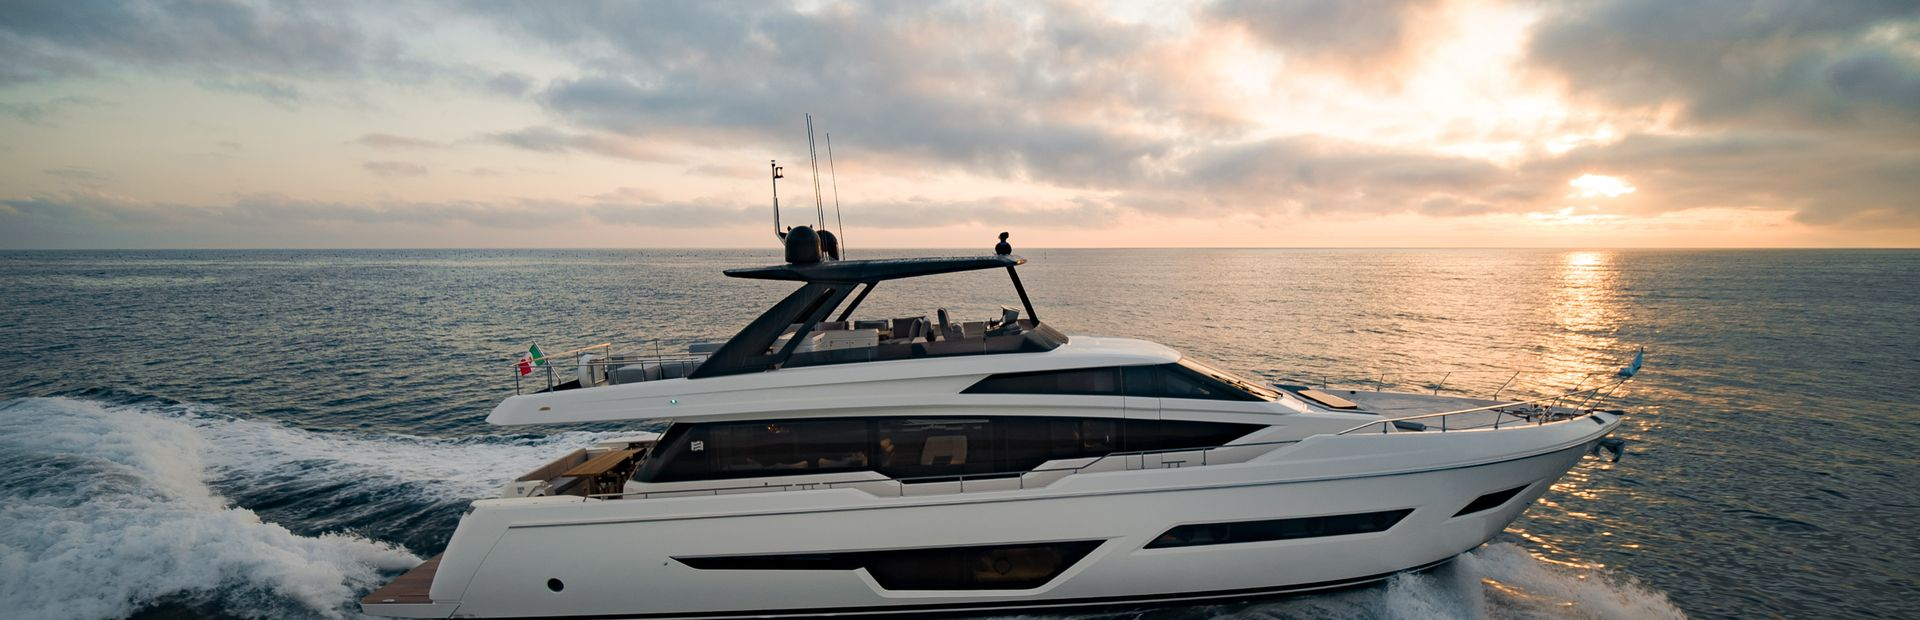 Ferretti Yachts 780 Yacht Charter